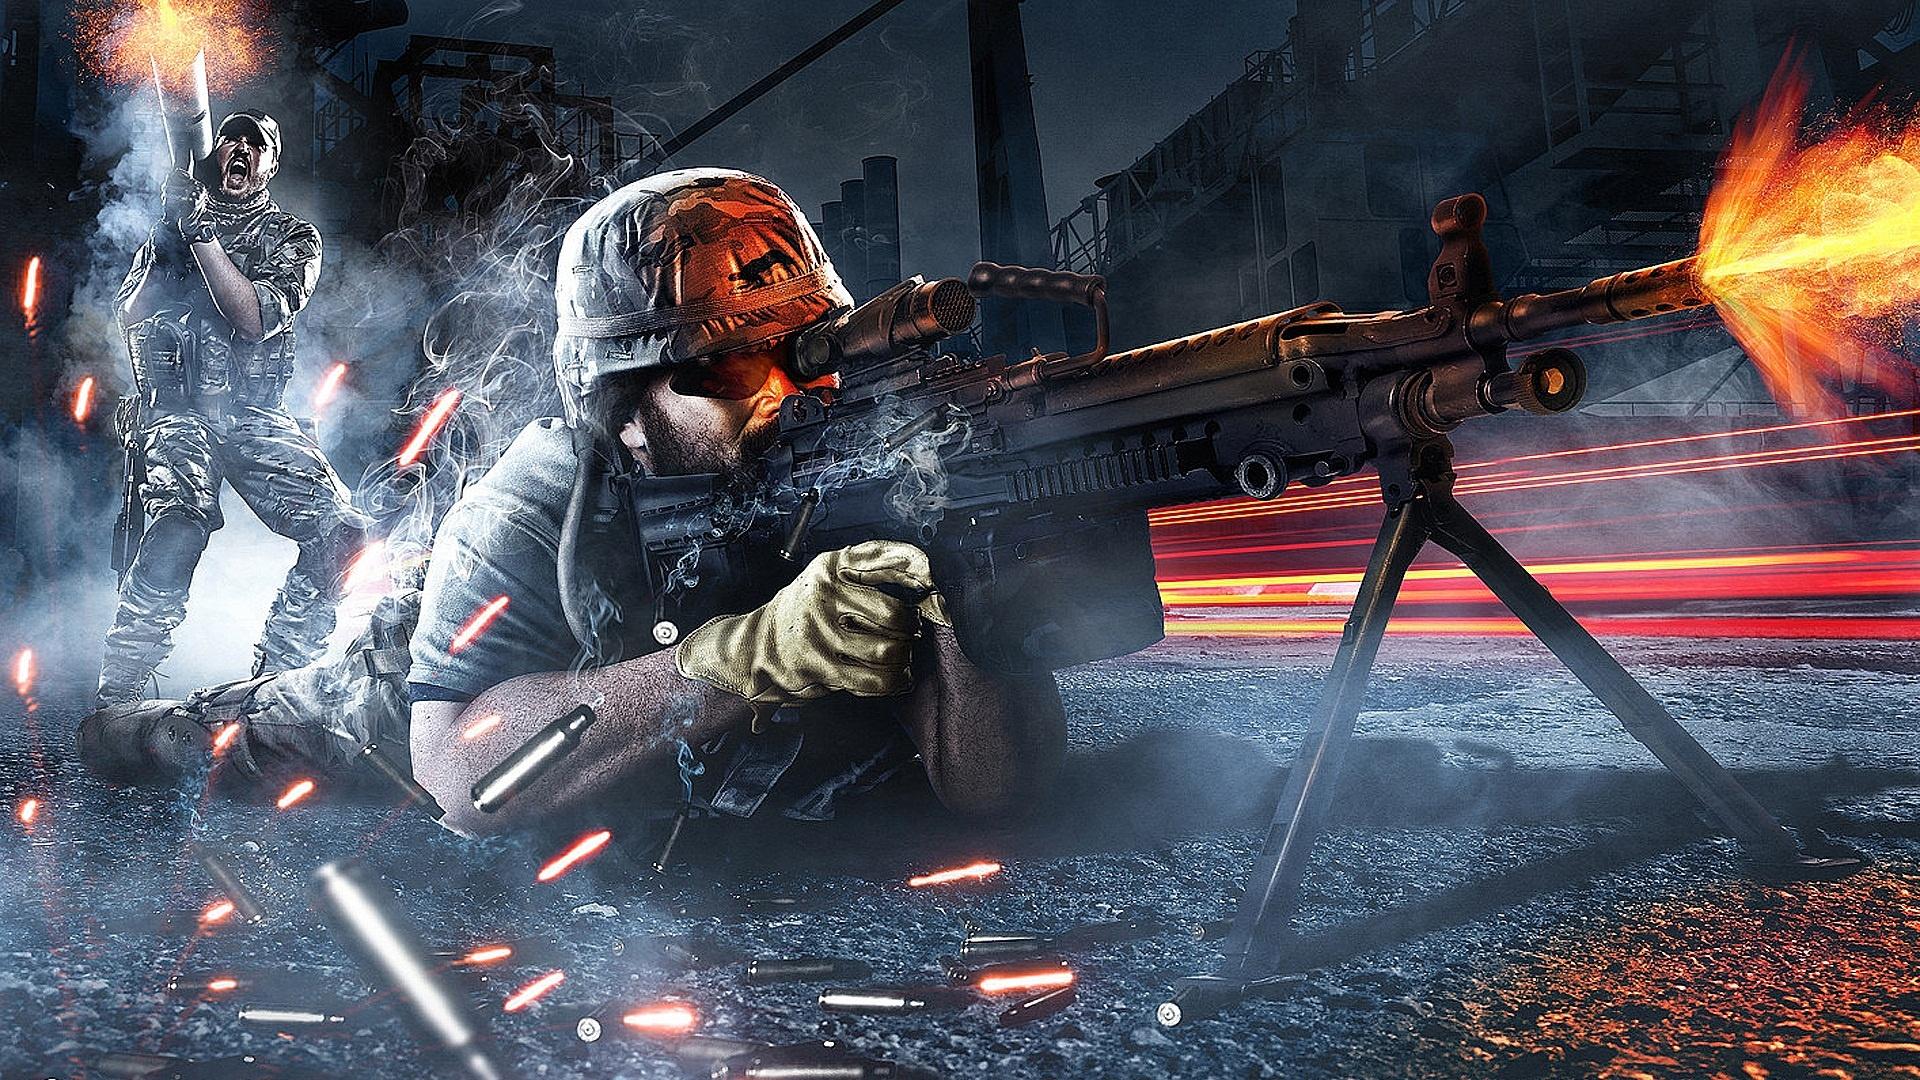 Cool Battlefield 4 Fire Armor In Black Background: Battlefield 3 Armored Kill Wallpapers